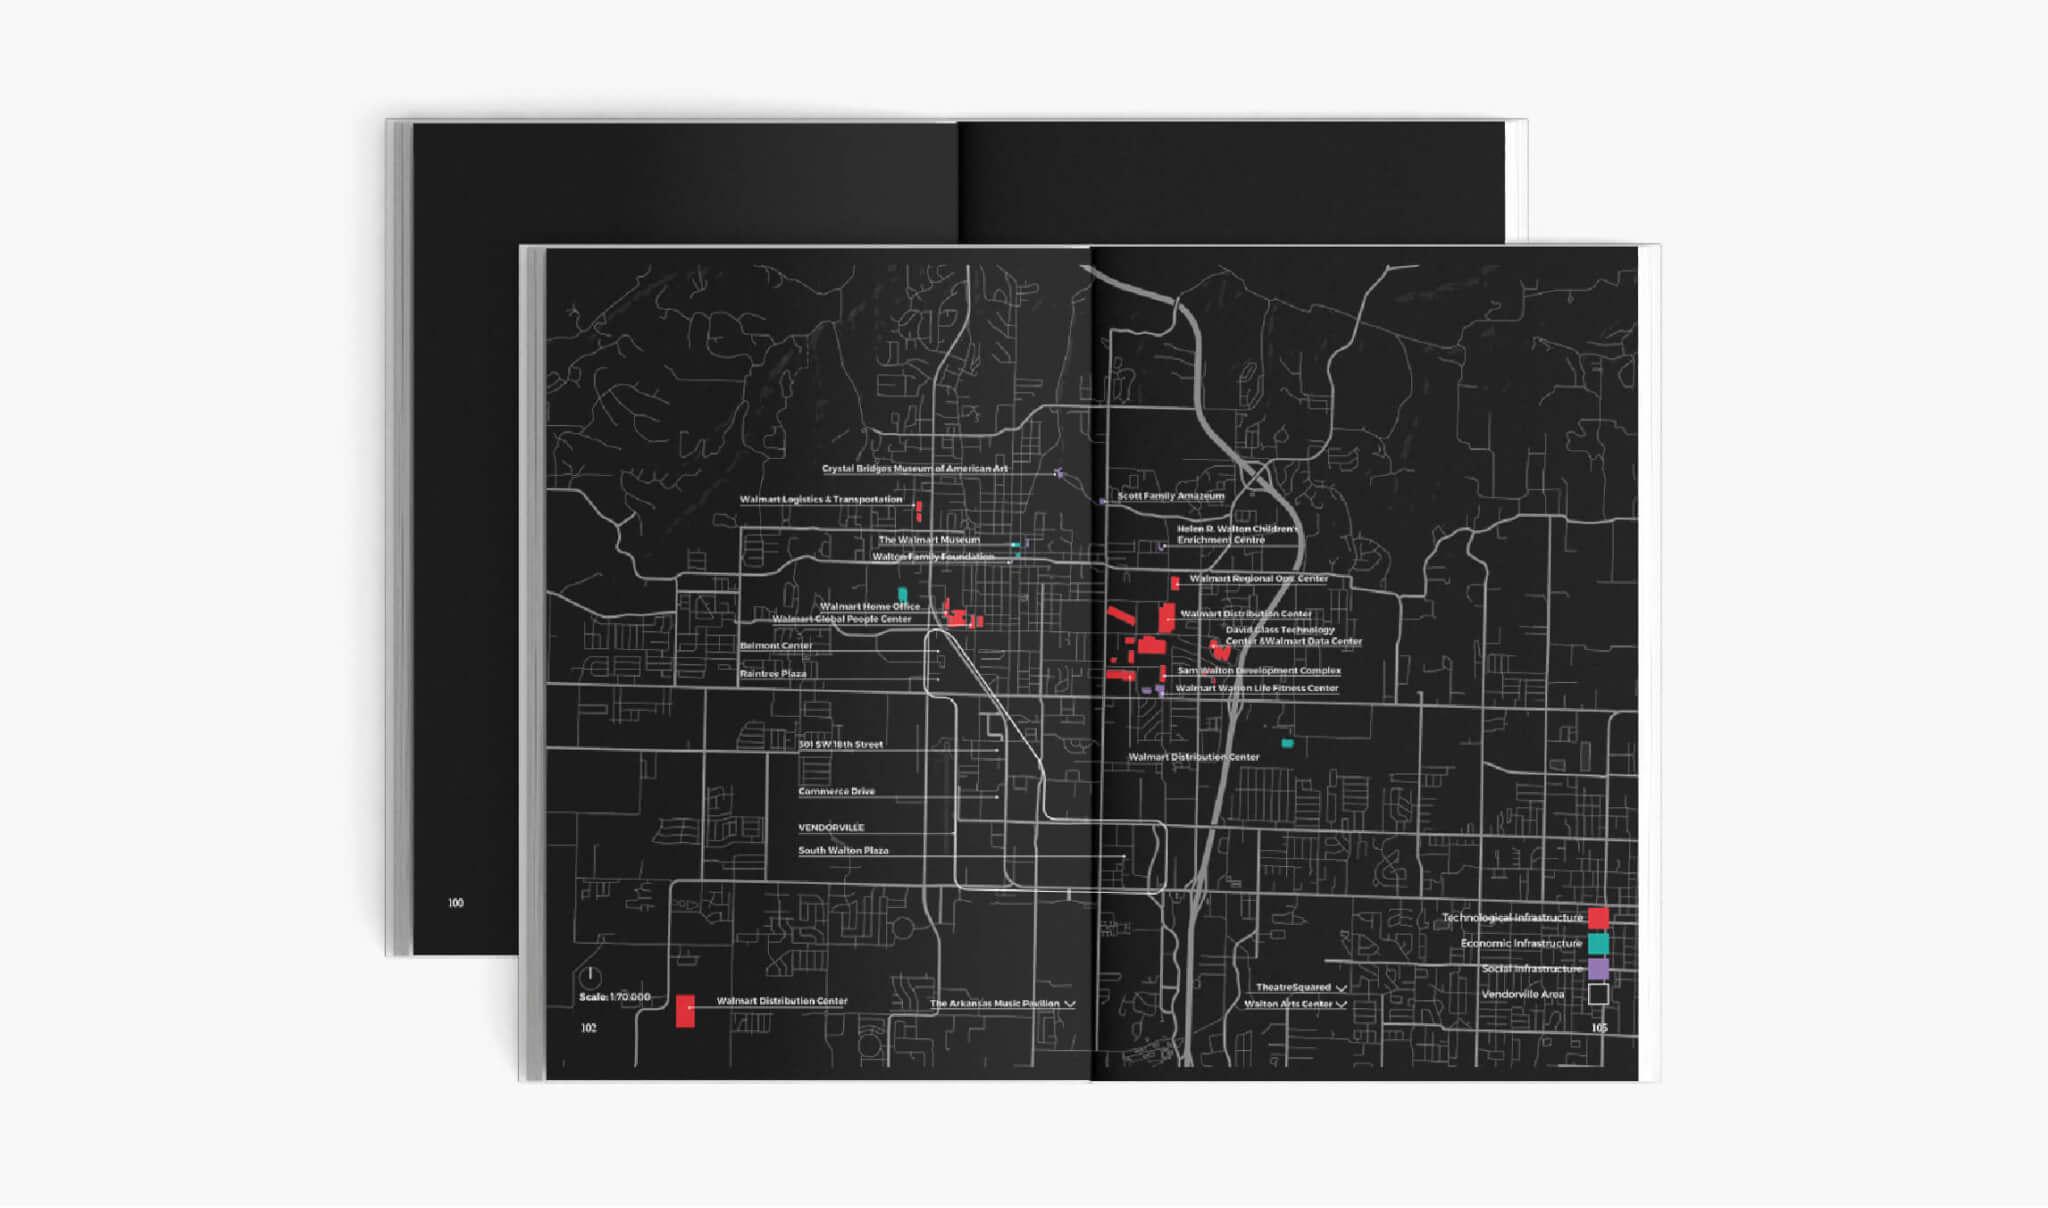 studio-interrobang-corporate-landscapes-mapping16